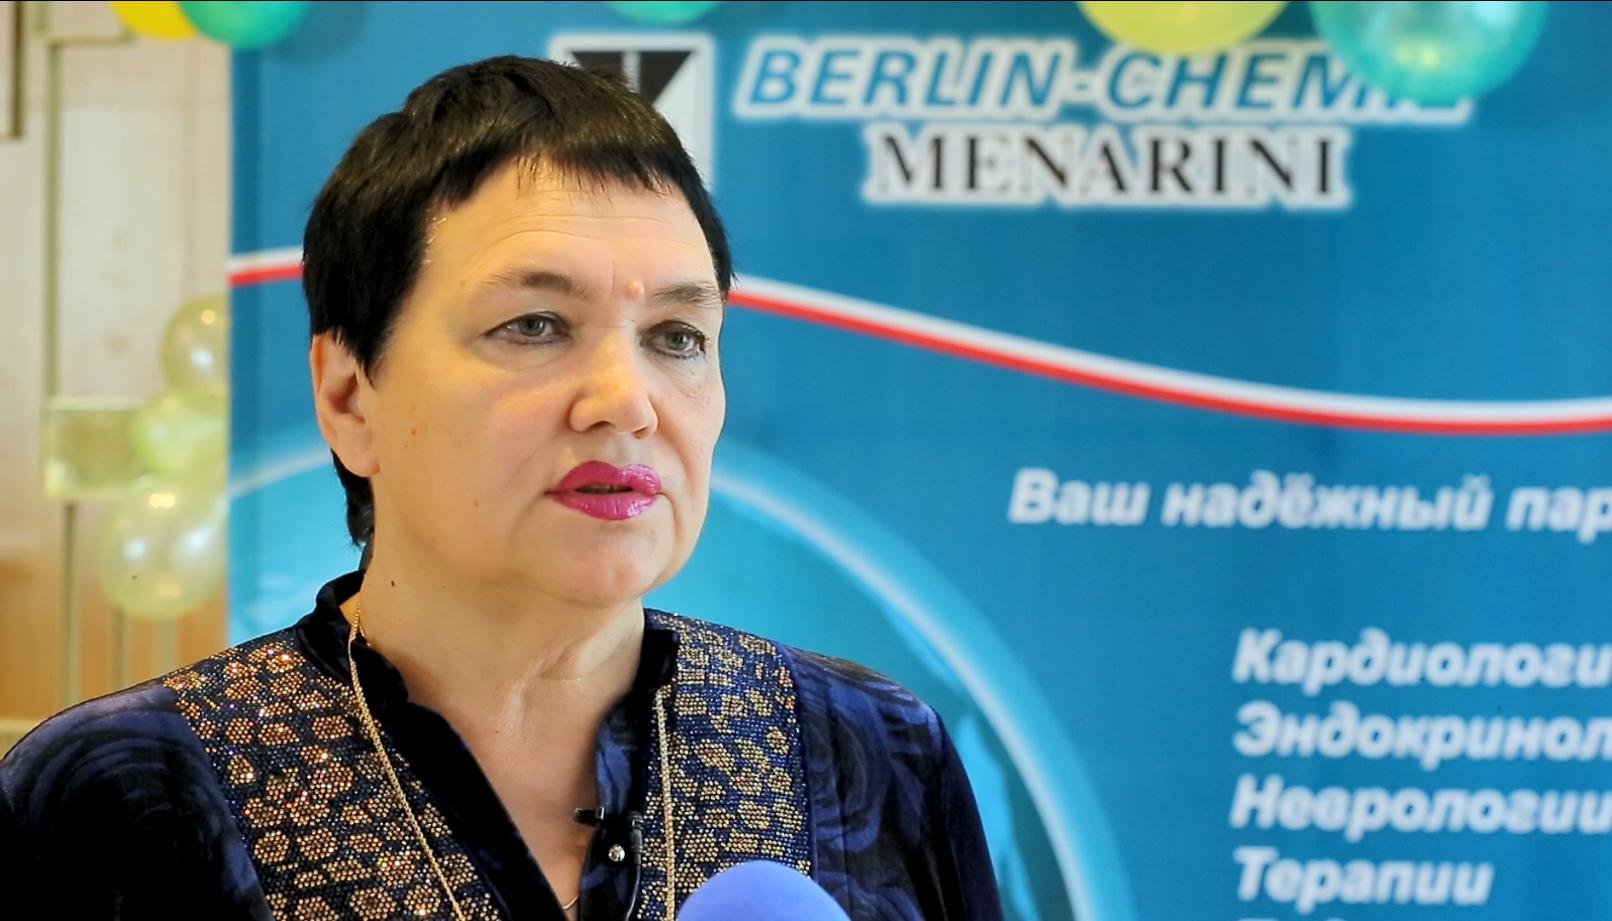 http://medicalexpress.ru/uploads/reportss/berlin/sanofi/01.PNG